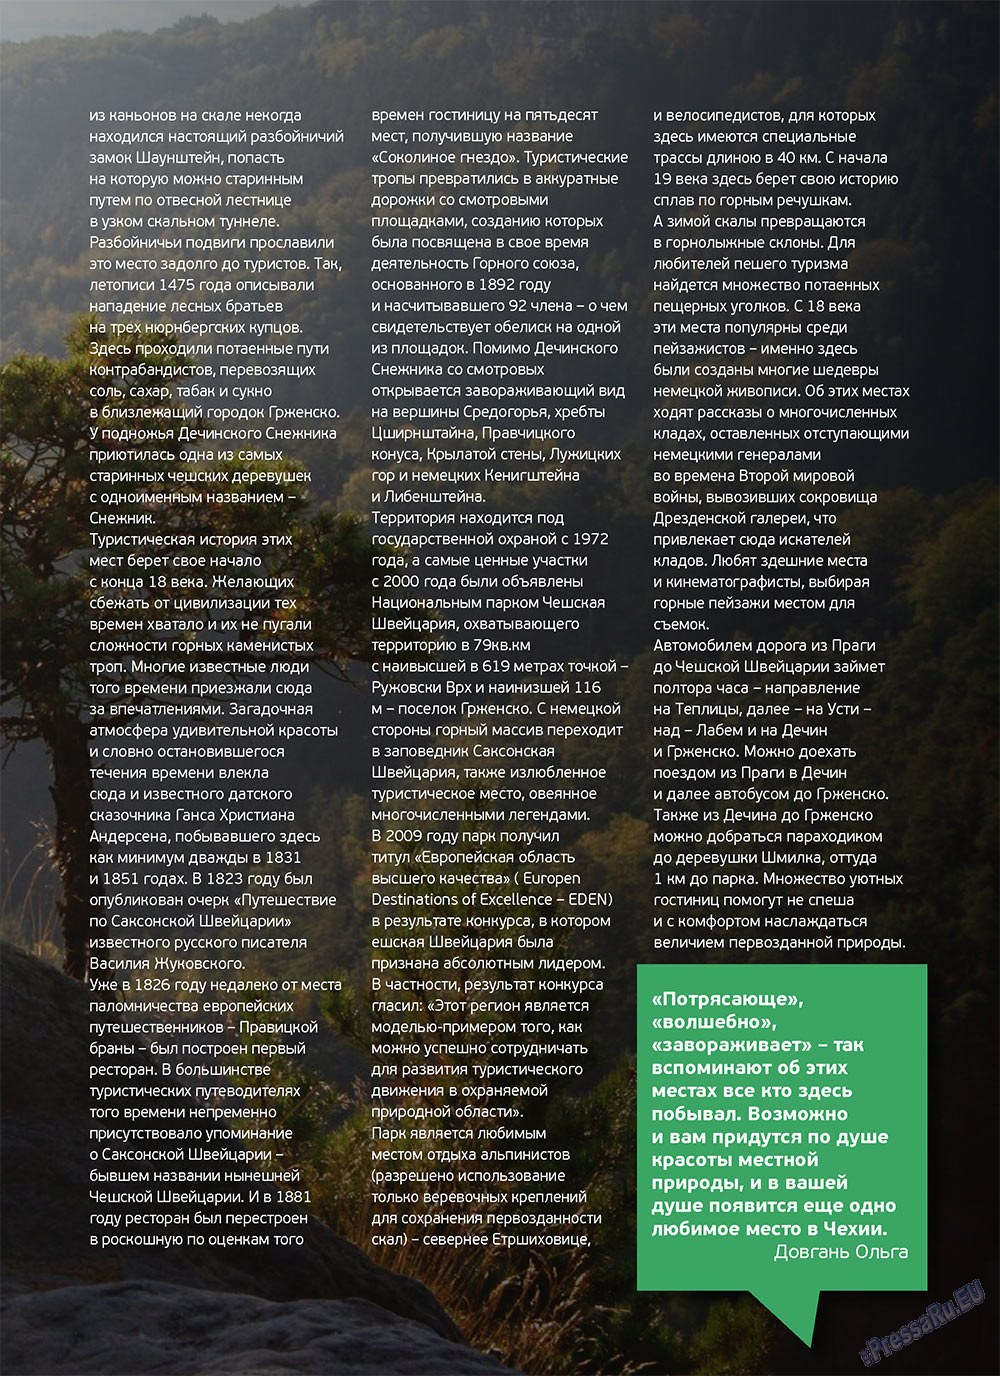 Артек (журнал). 2011 год, номер 3, стр. 33